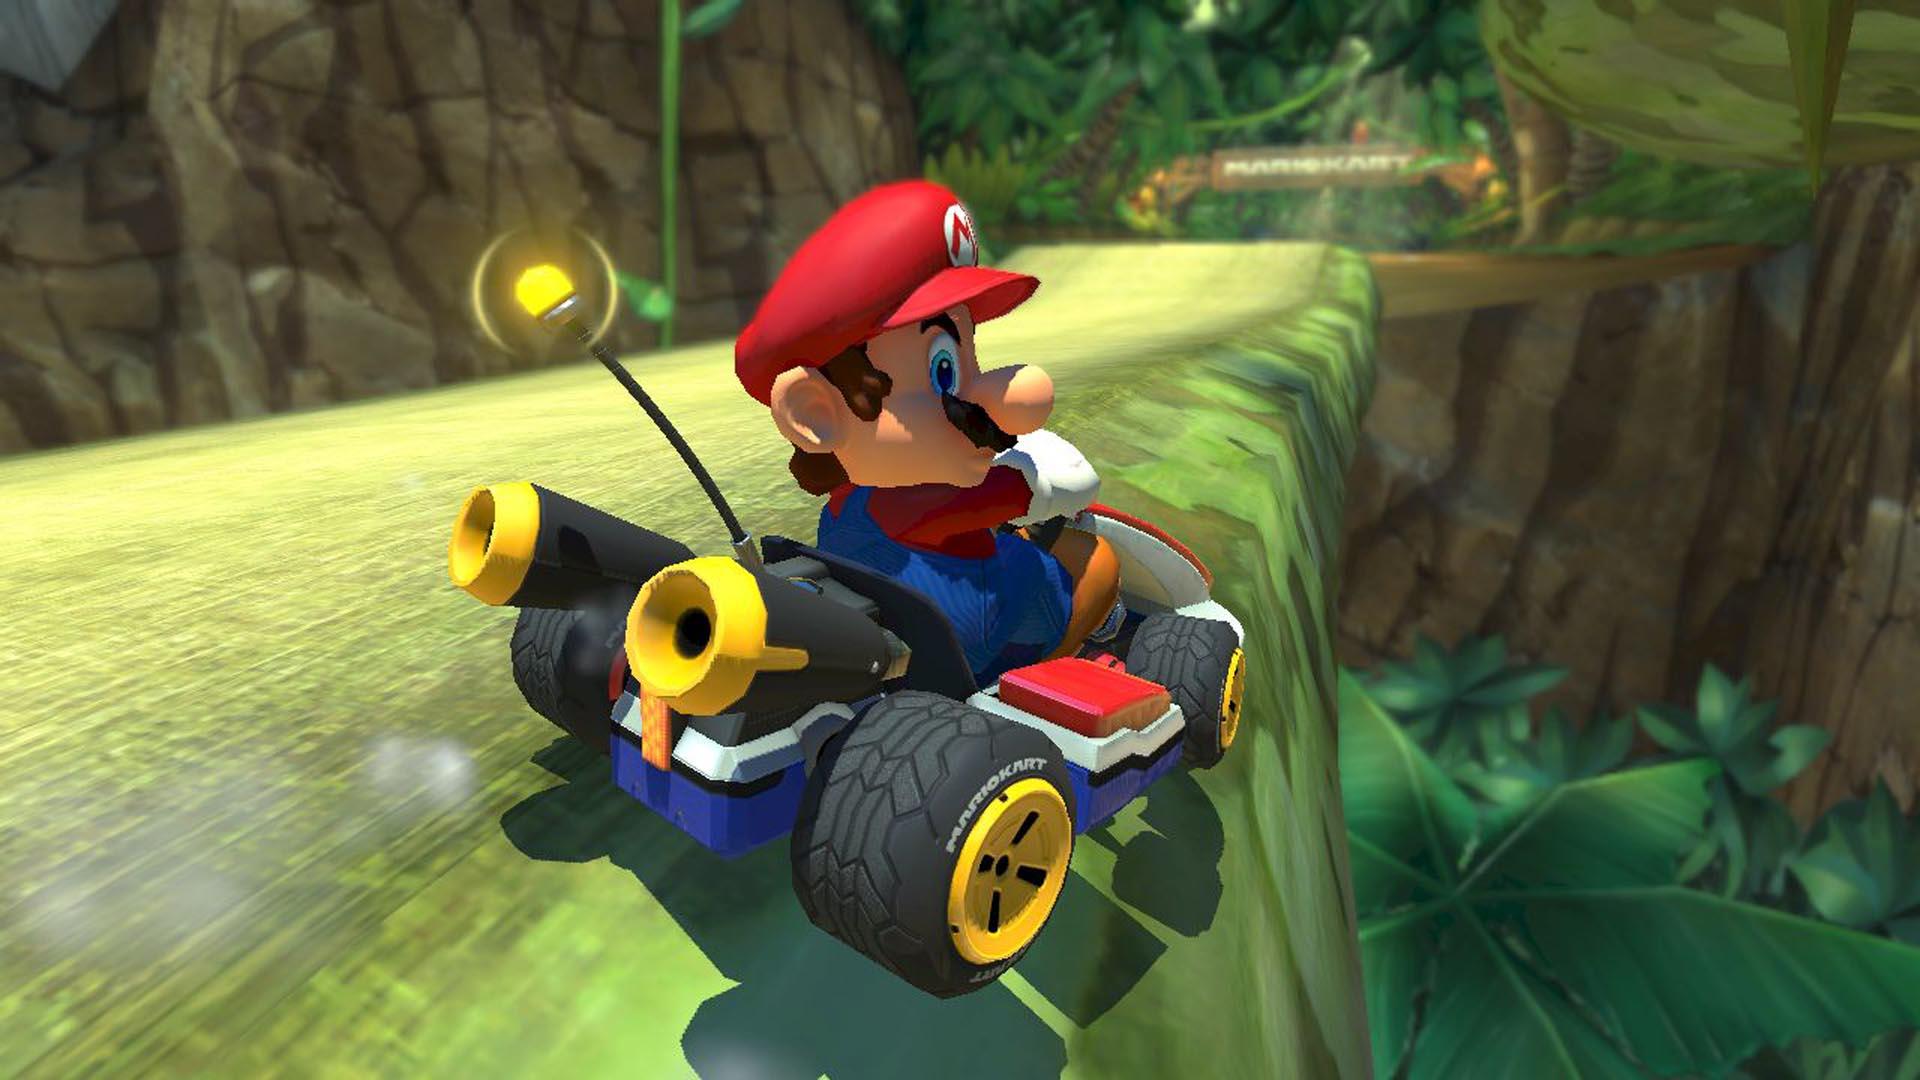 2_NintendoSwitch_MarioKart8_Screenshot_MarioKart_Presentation2017_scrn30